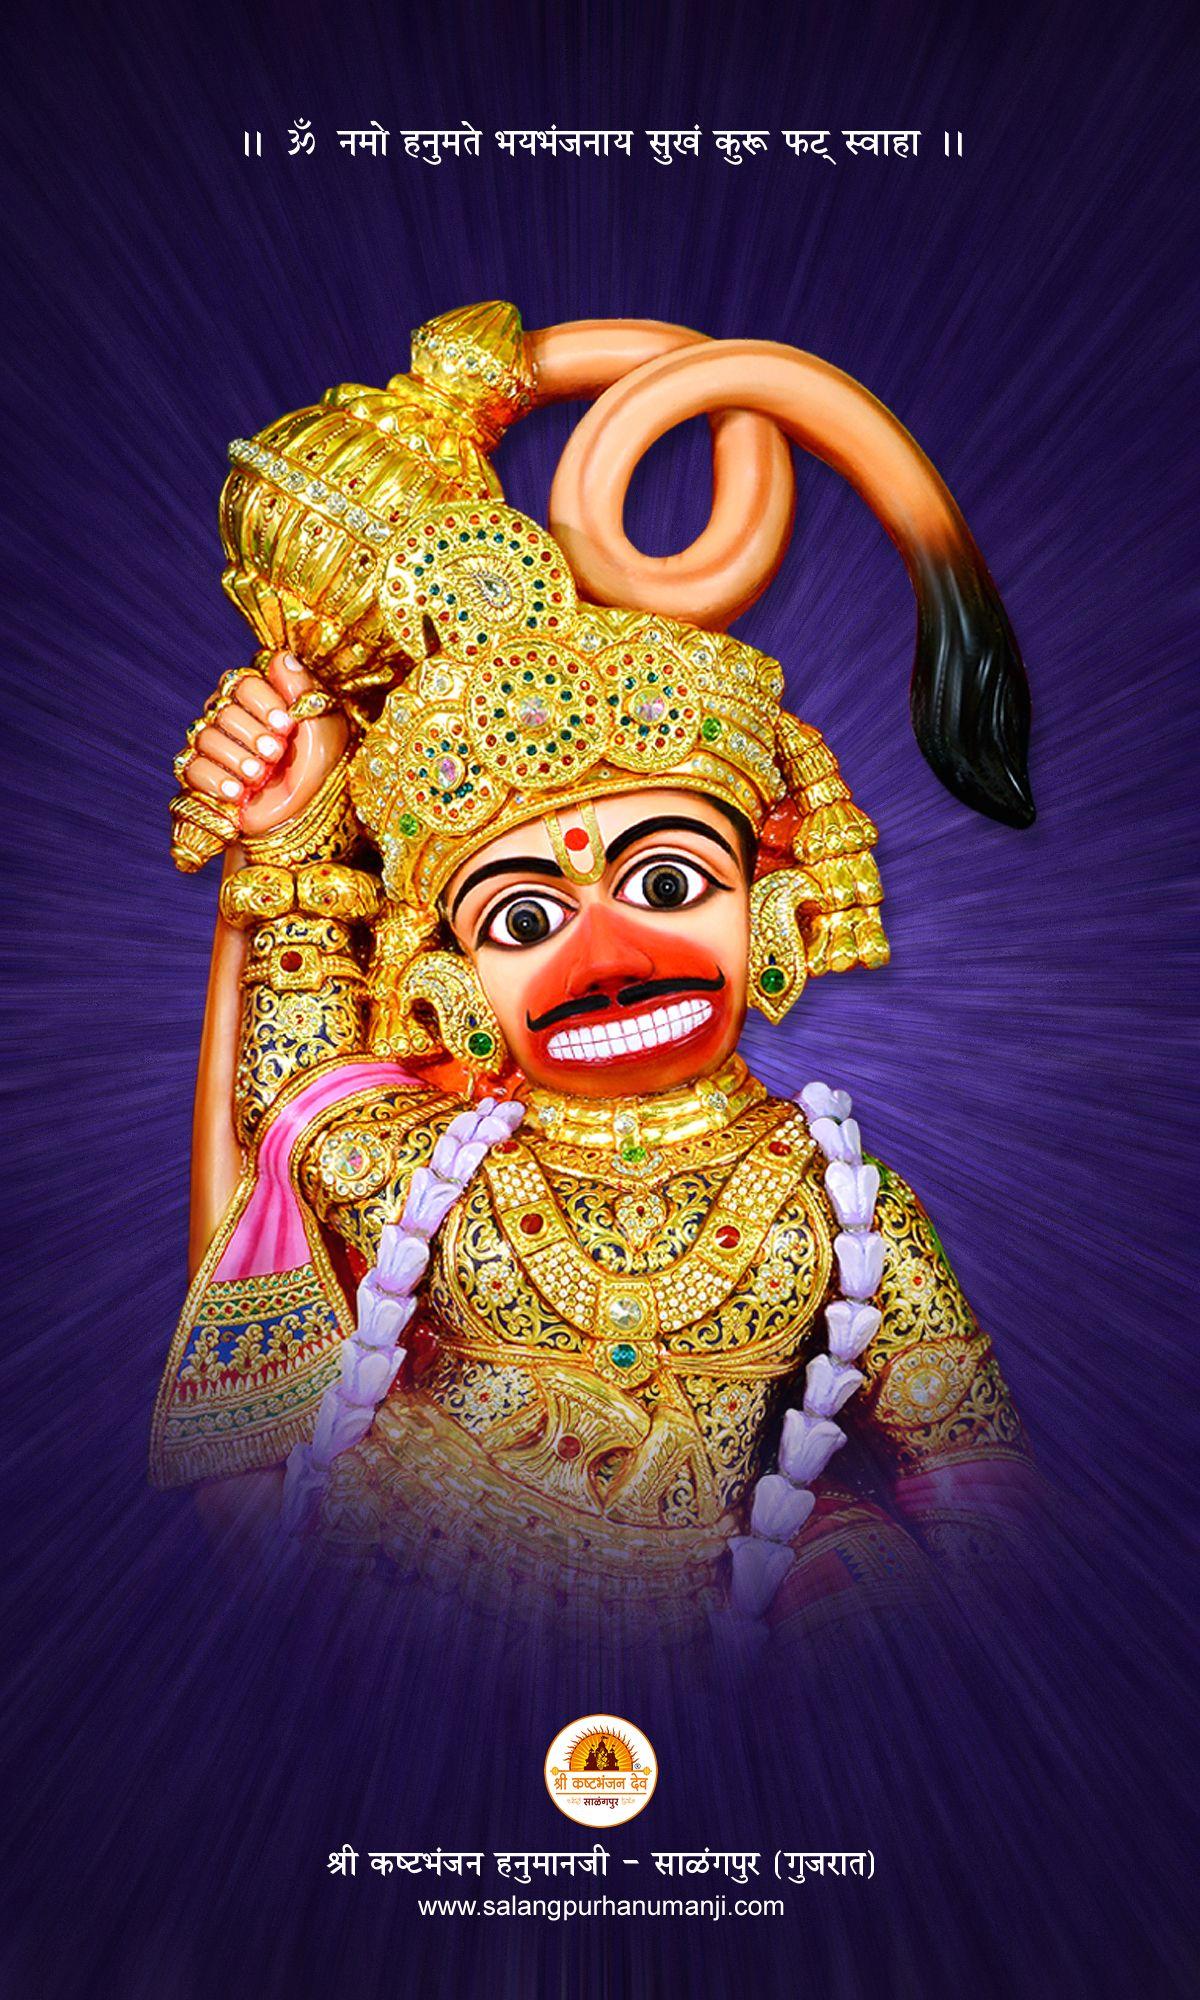 Welcome To Kashtbhanjandev Temple Salangpur Hanuman Hd Wallpaper Hanuman Wallpaper Hanumanji Full hd 1080p ultra hd hanuman hd